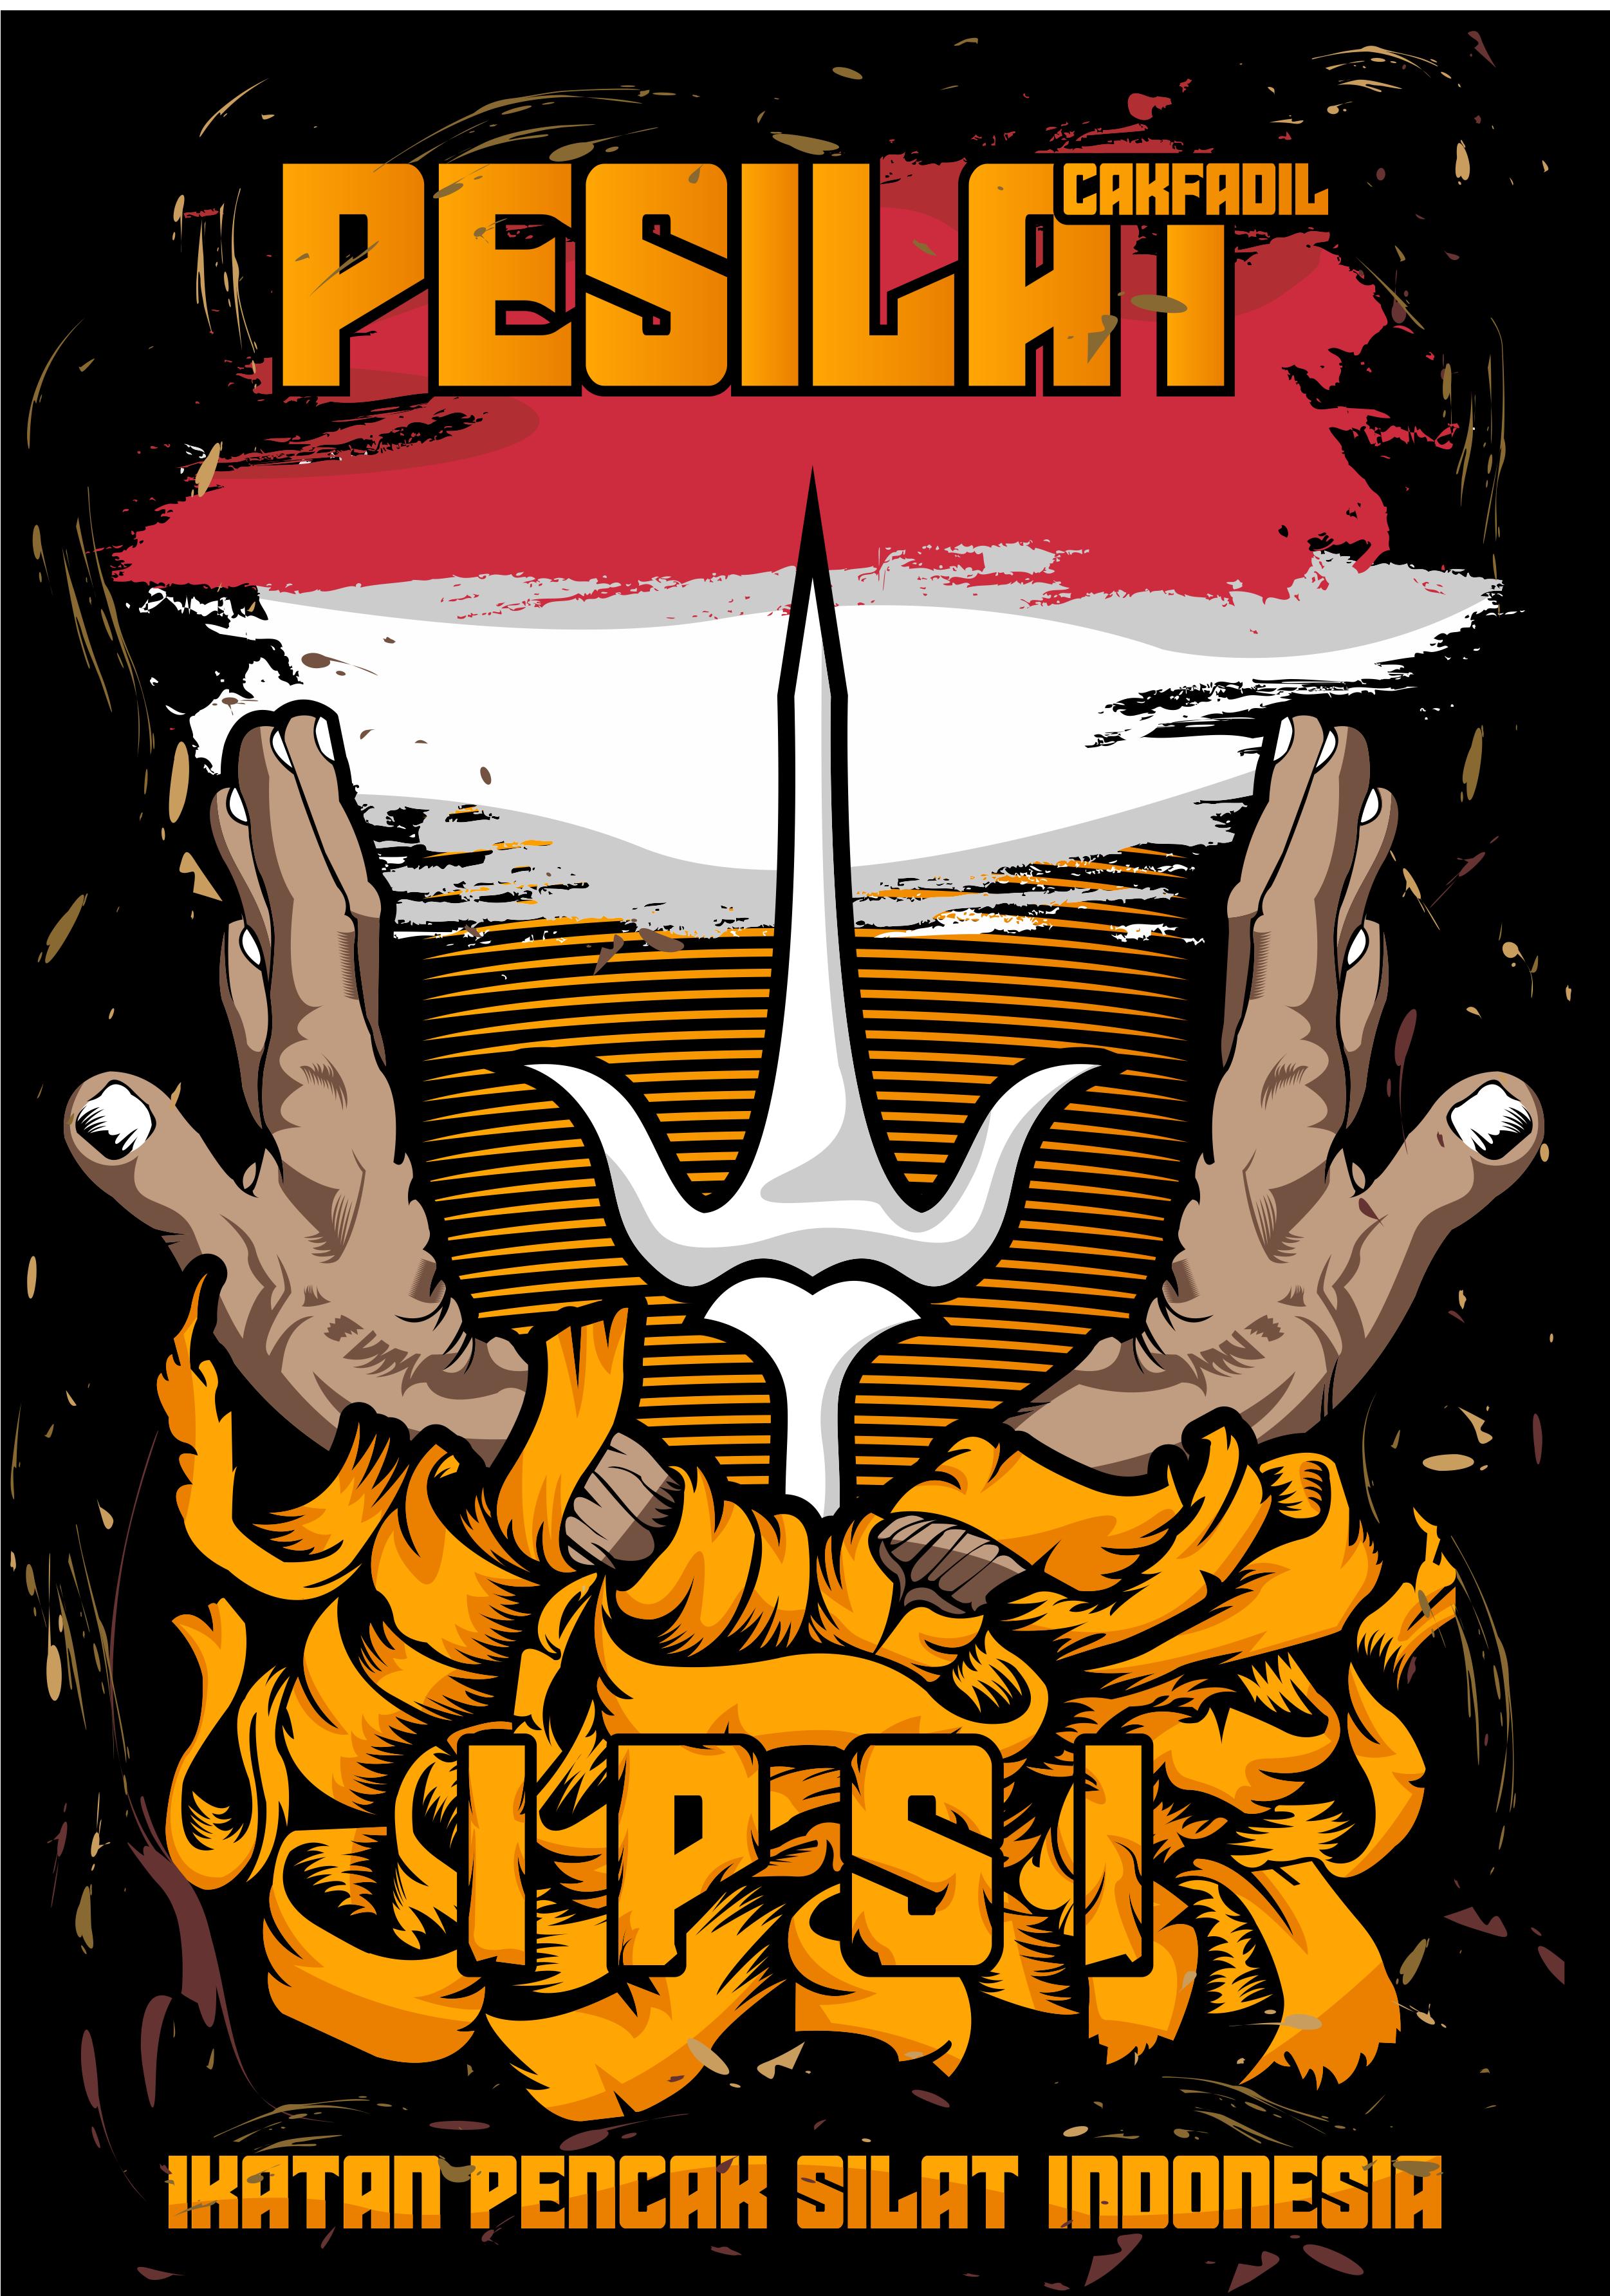 Gambar Logo Pencak Silat : gambar, pencak, silat, Ikatan, Pencak, Silat, Indonesia, Design, Kaos,, Graphic, Logo,, Combat